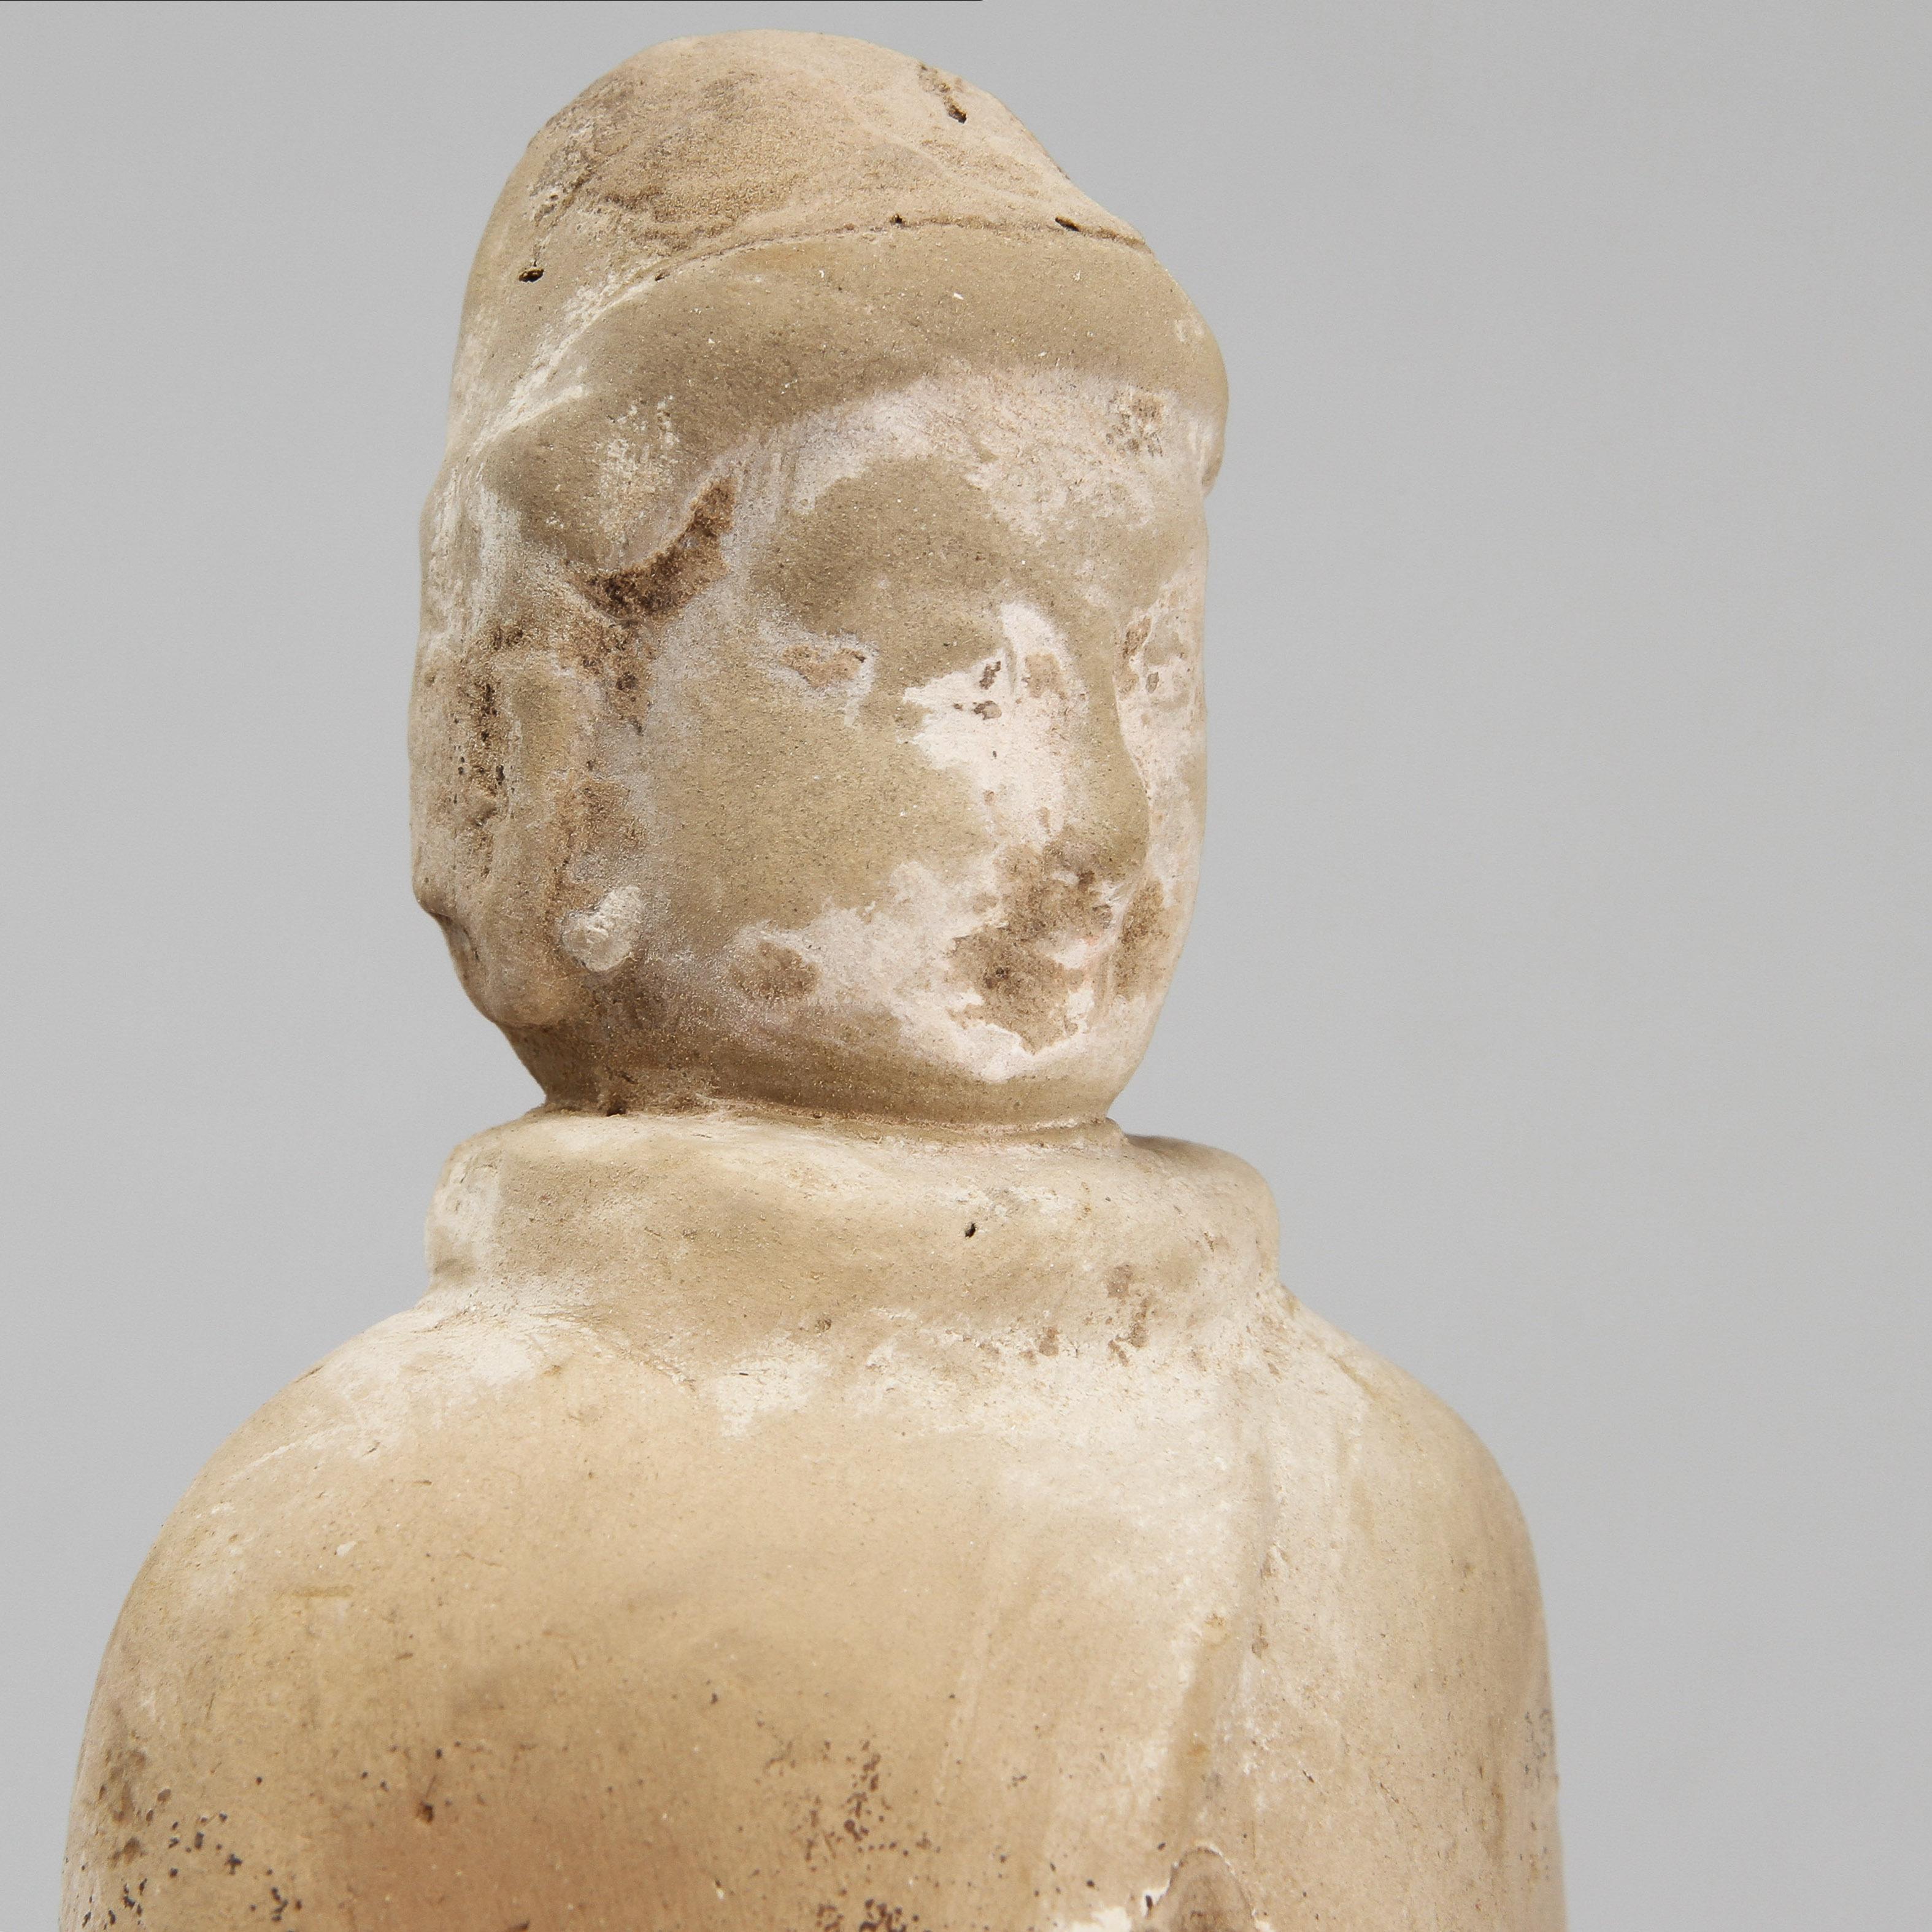 Figur Lergods Kina Sannolikt Wei Ceramics Porcelain